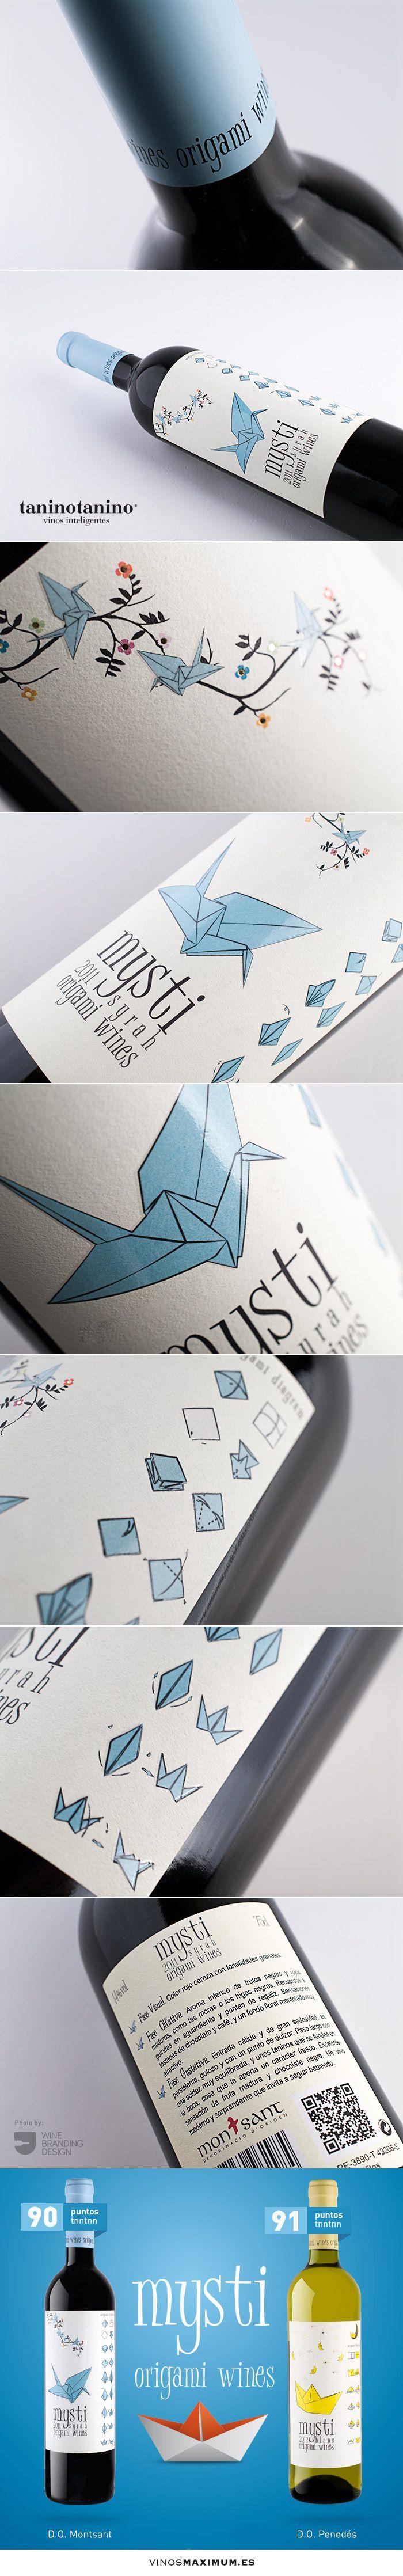 origami wines mysti - TANINOTANINO VINOS INTELIGENTES - VINOS MAXIMUM